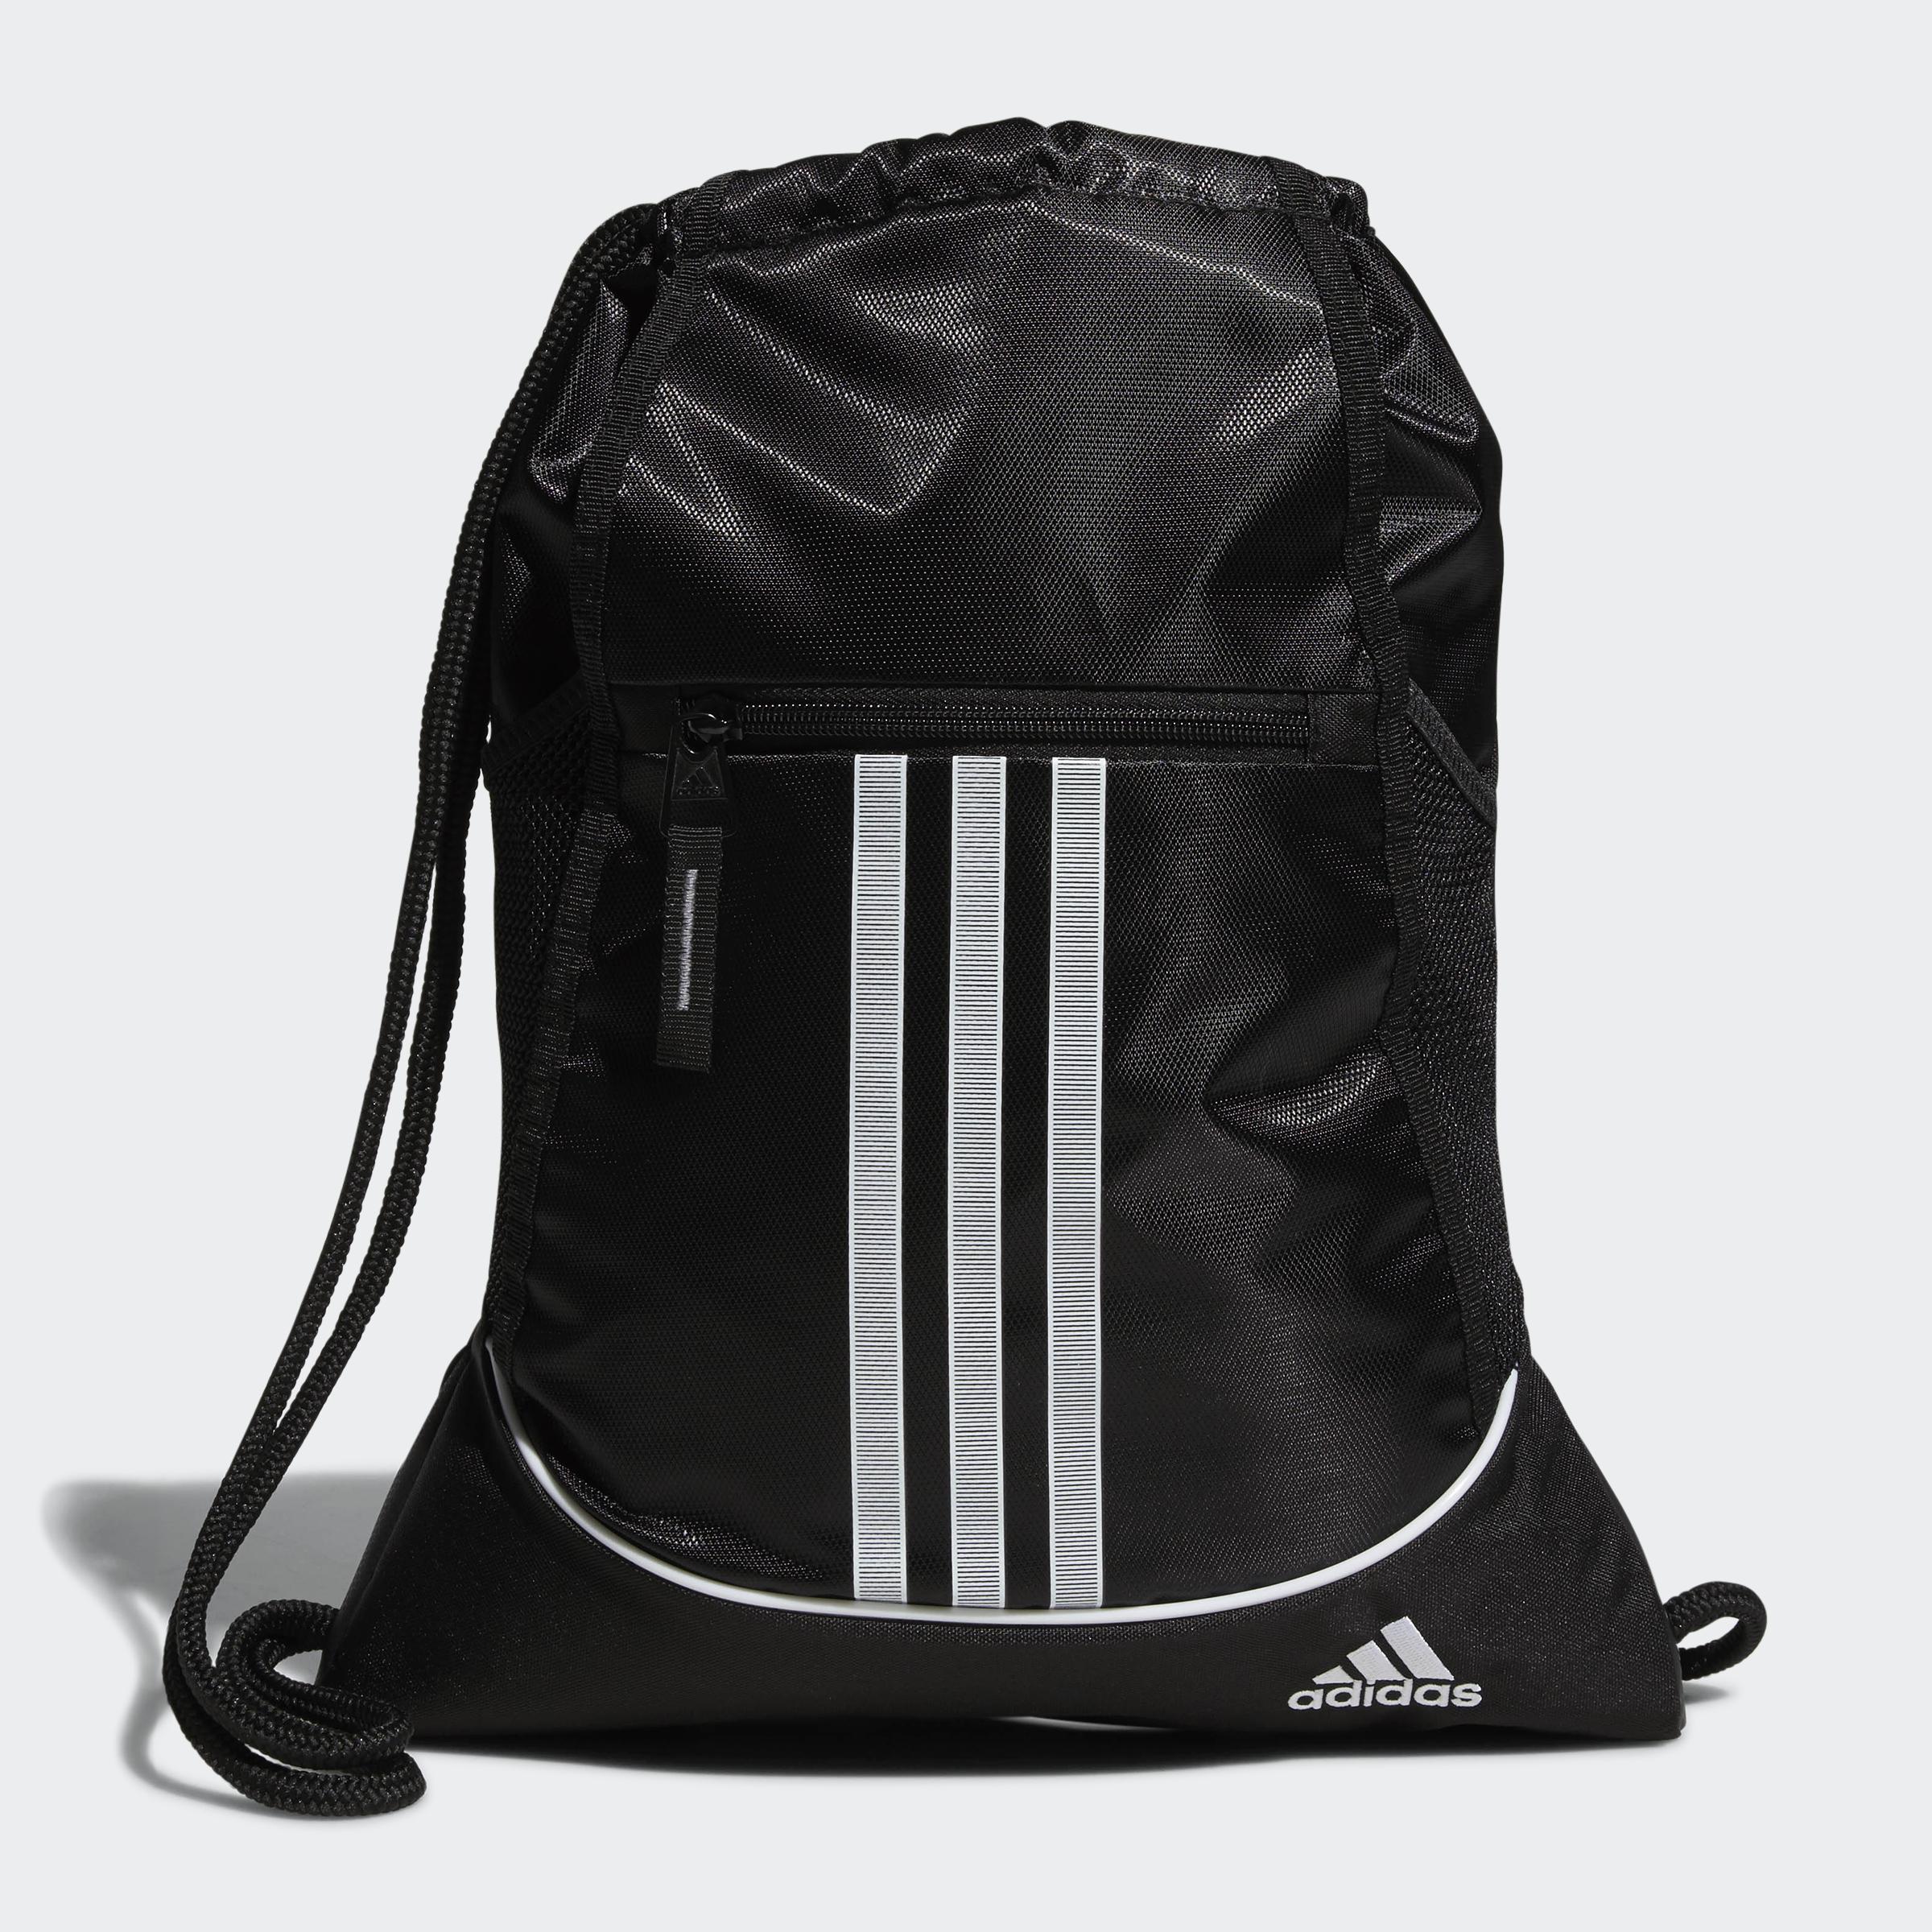 adidas-Lightning-Sackpack-Bags miniature 17